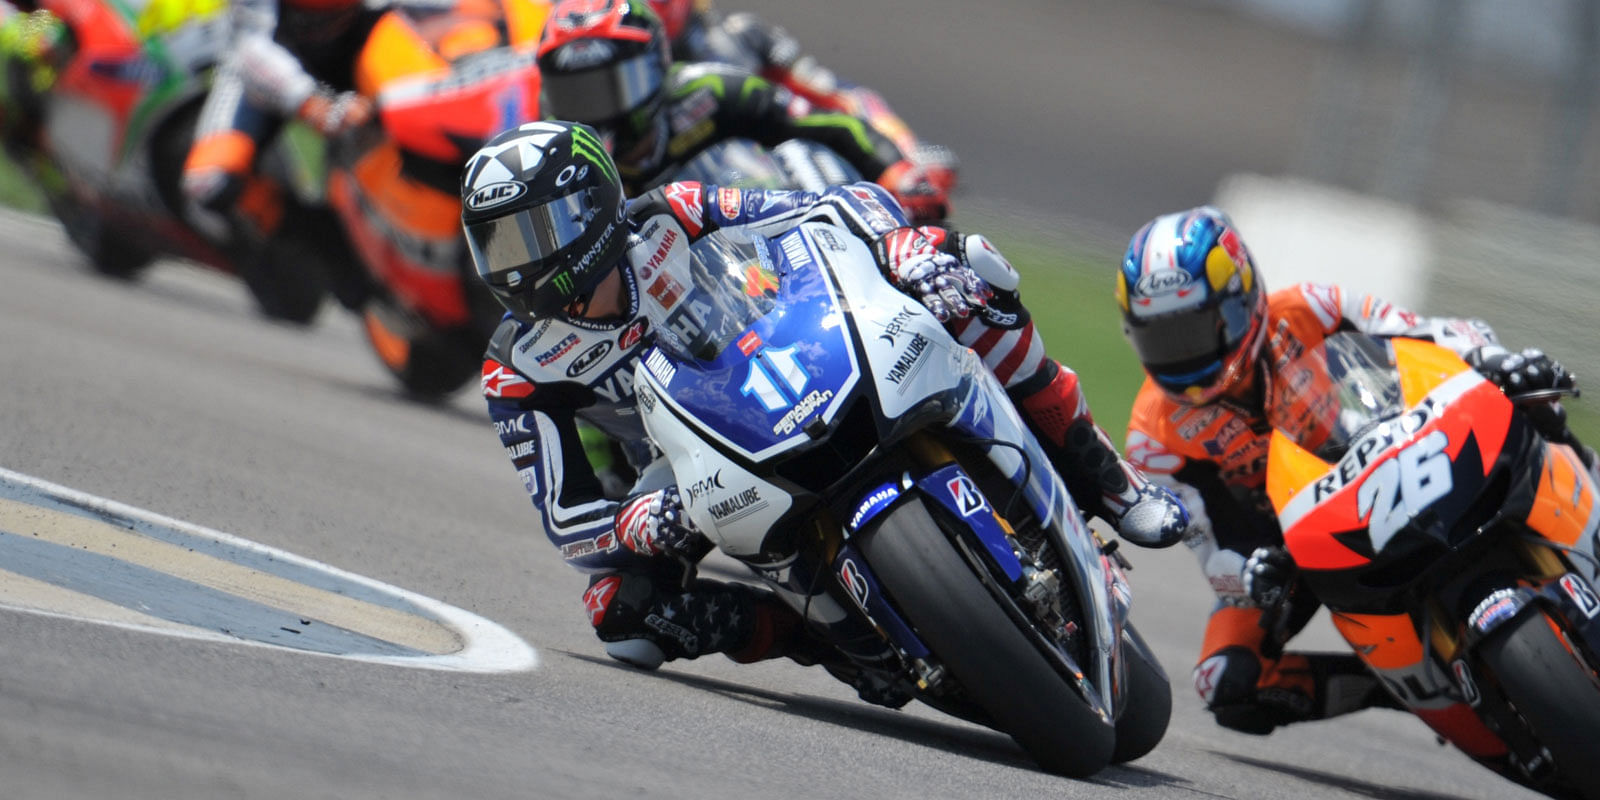 Moto GP Network